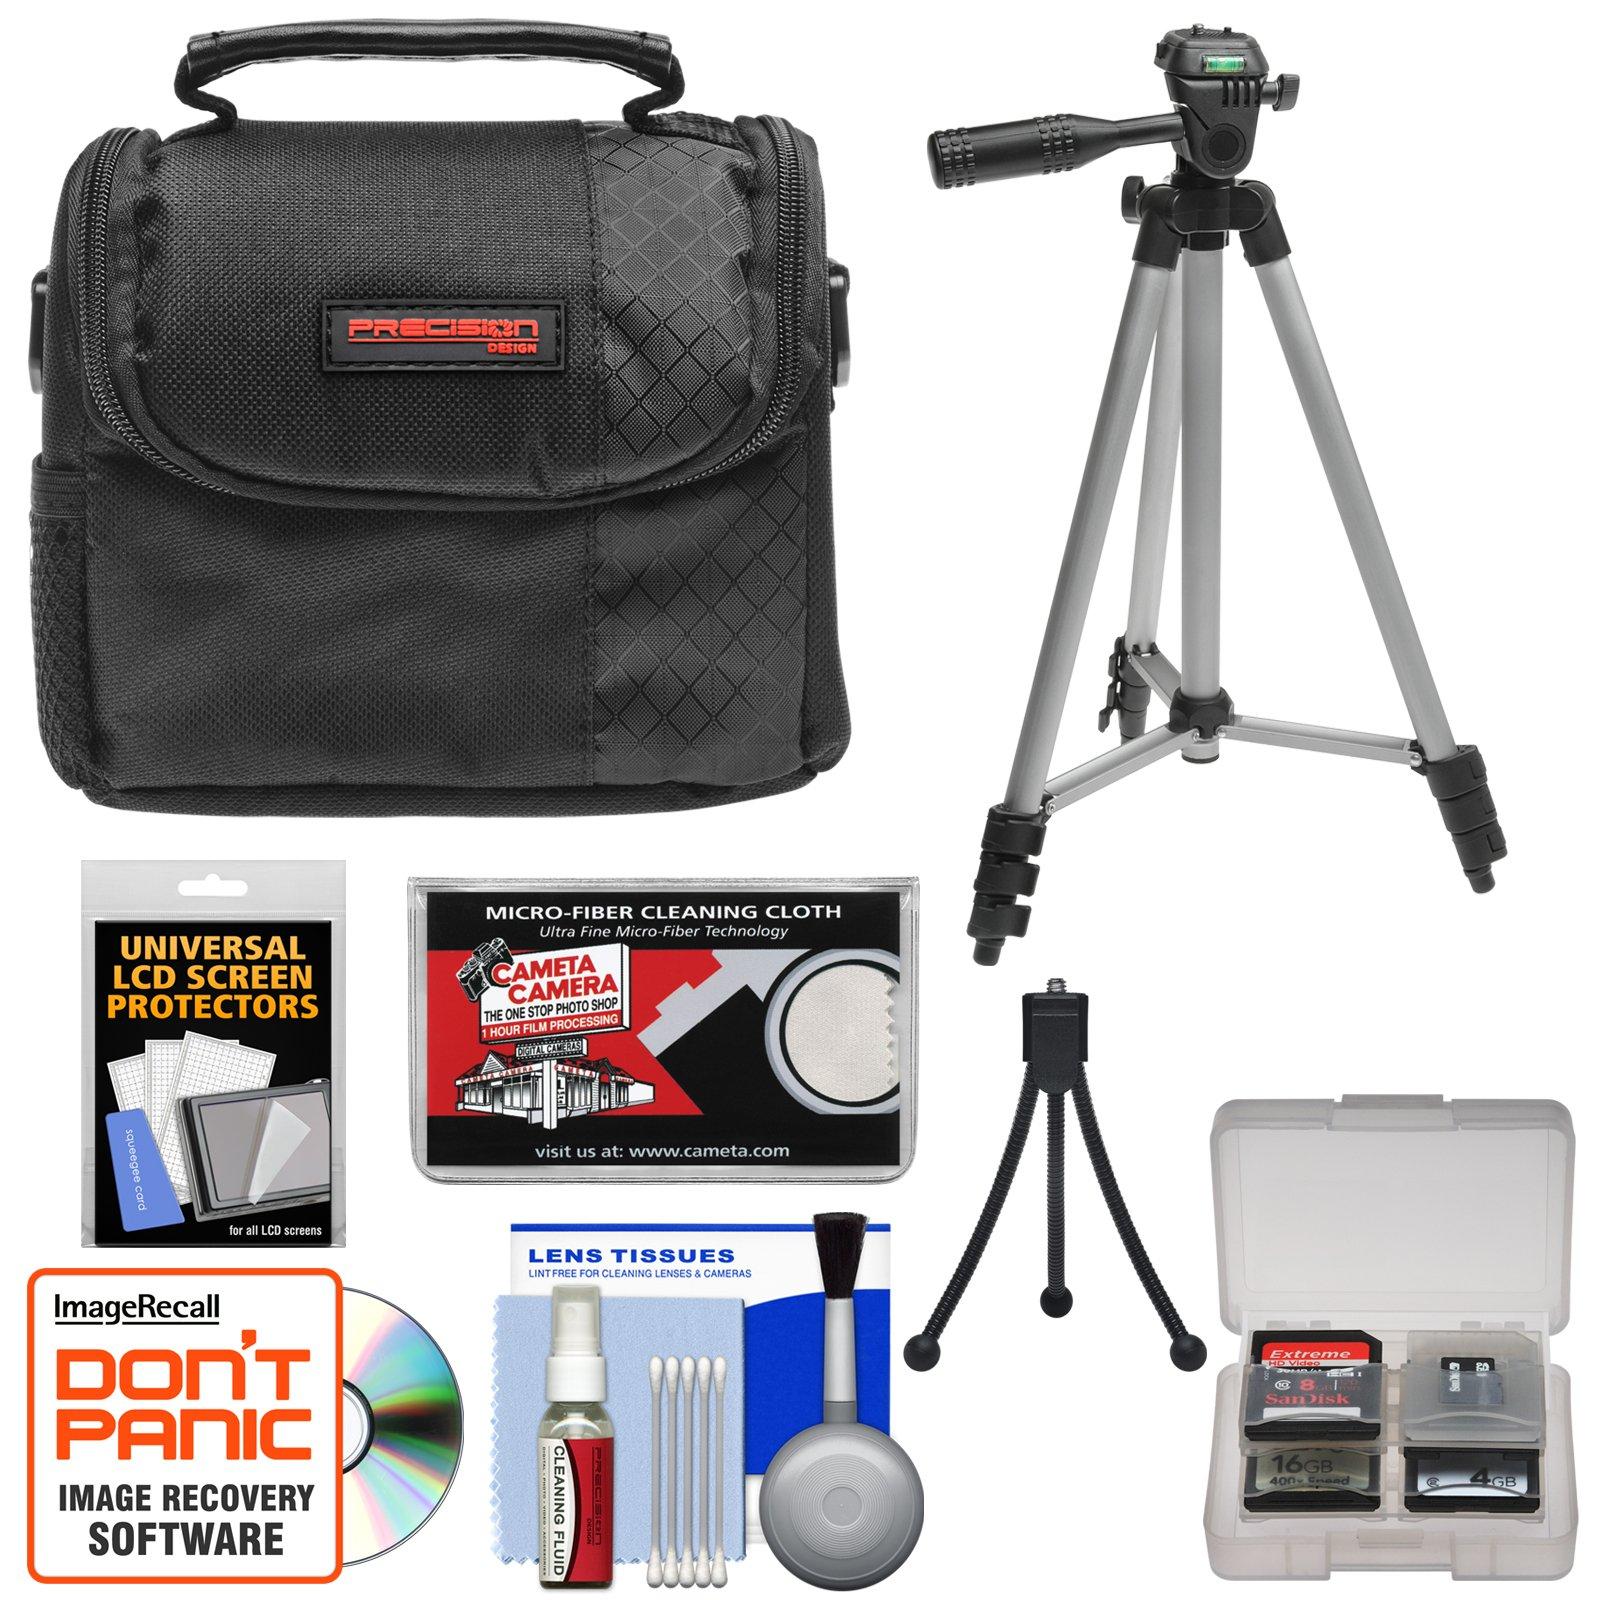 Sony CyberShot Digital Cameras Accessory Kit with Camera Case & Tripod for DSC-H70, T99, TX9, TX10, W560, W570, WX5, WX9, WX10